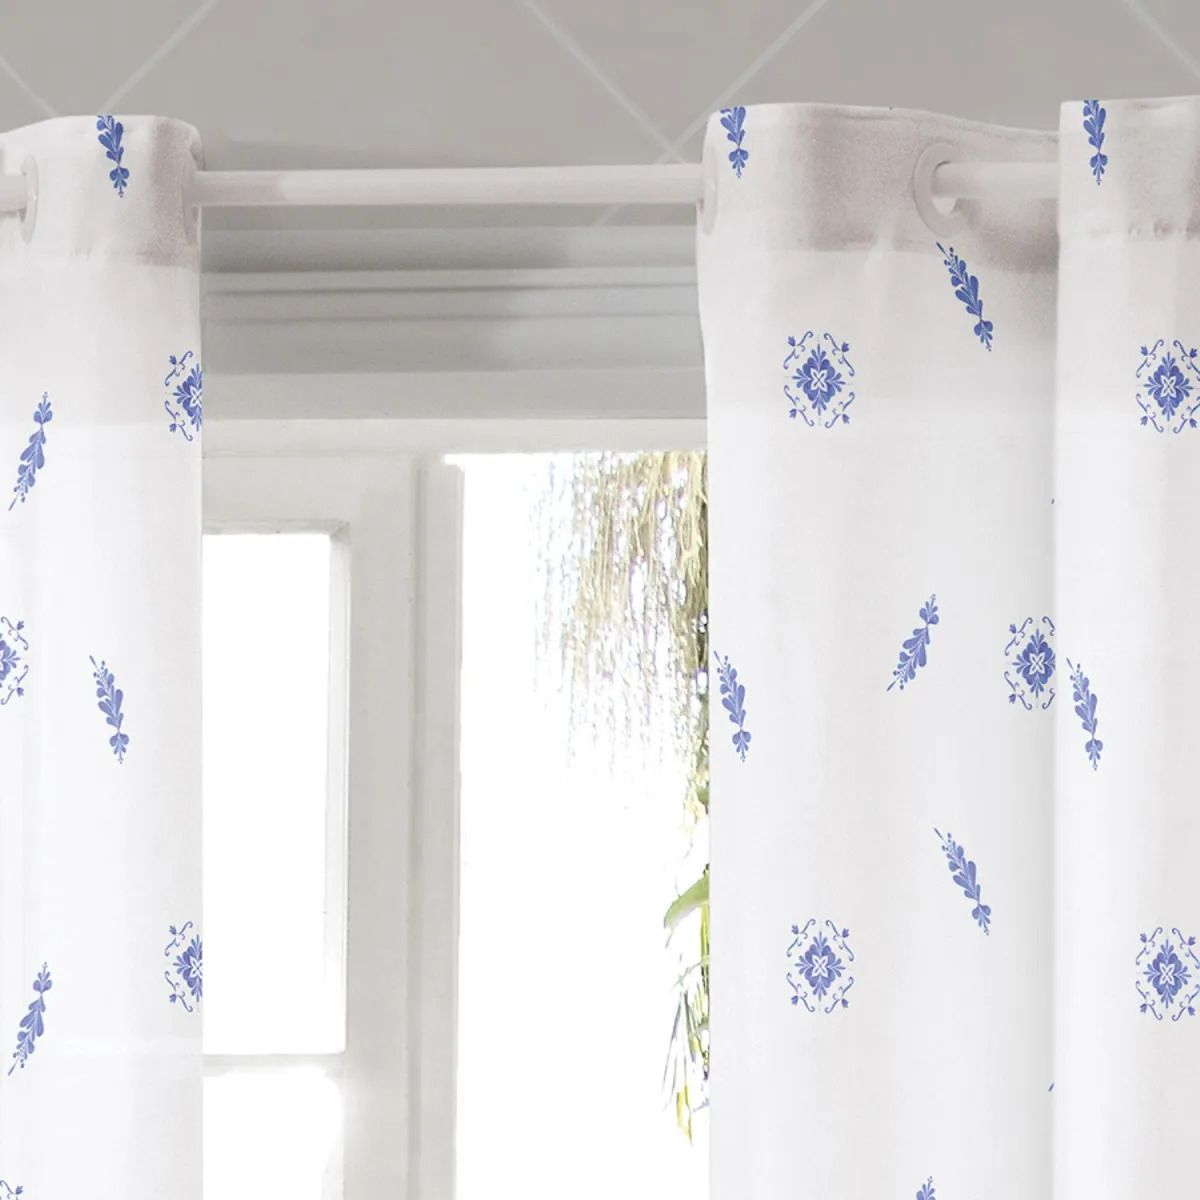 Cortina De Cozinha Allegra Porcelana Azul 2,60 x 1,20 Bella Janela